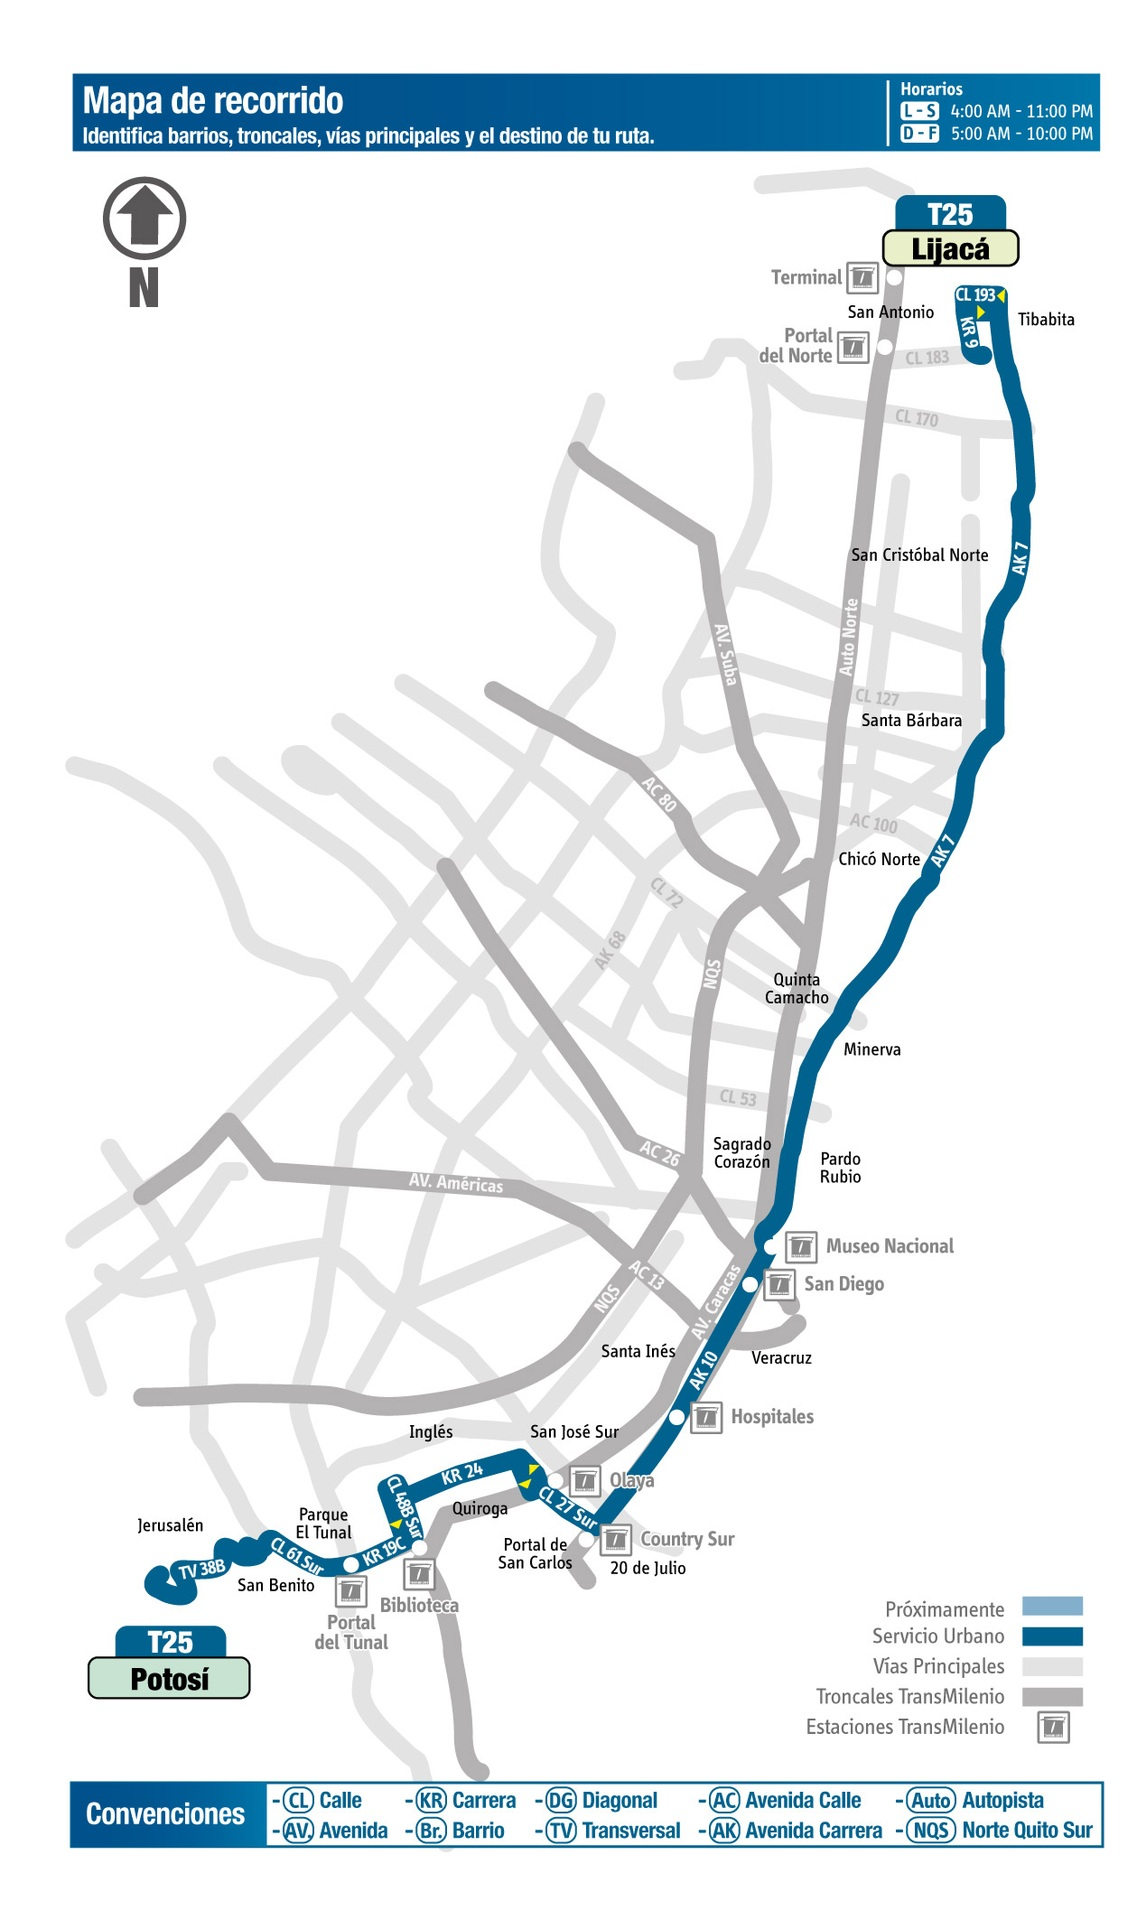 Ruta SITP: T25 Potosí ↔ Lijacá [Urbana] 2